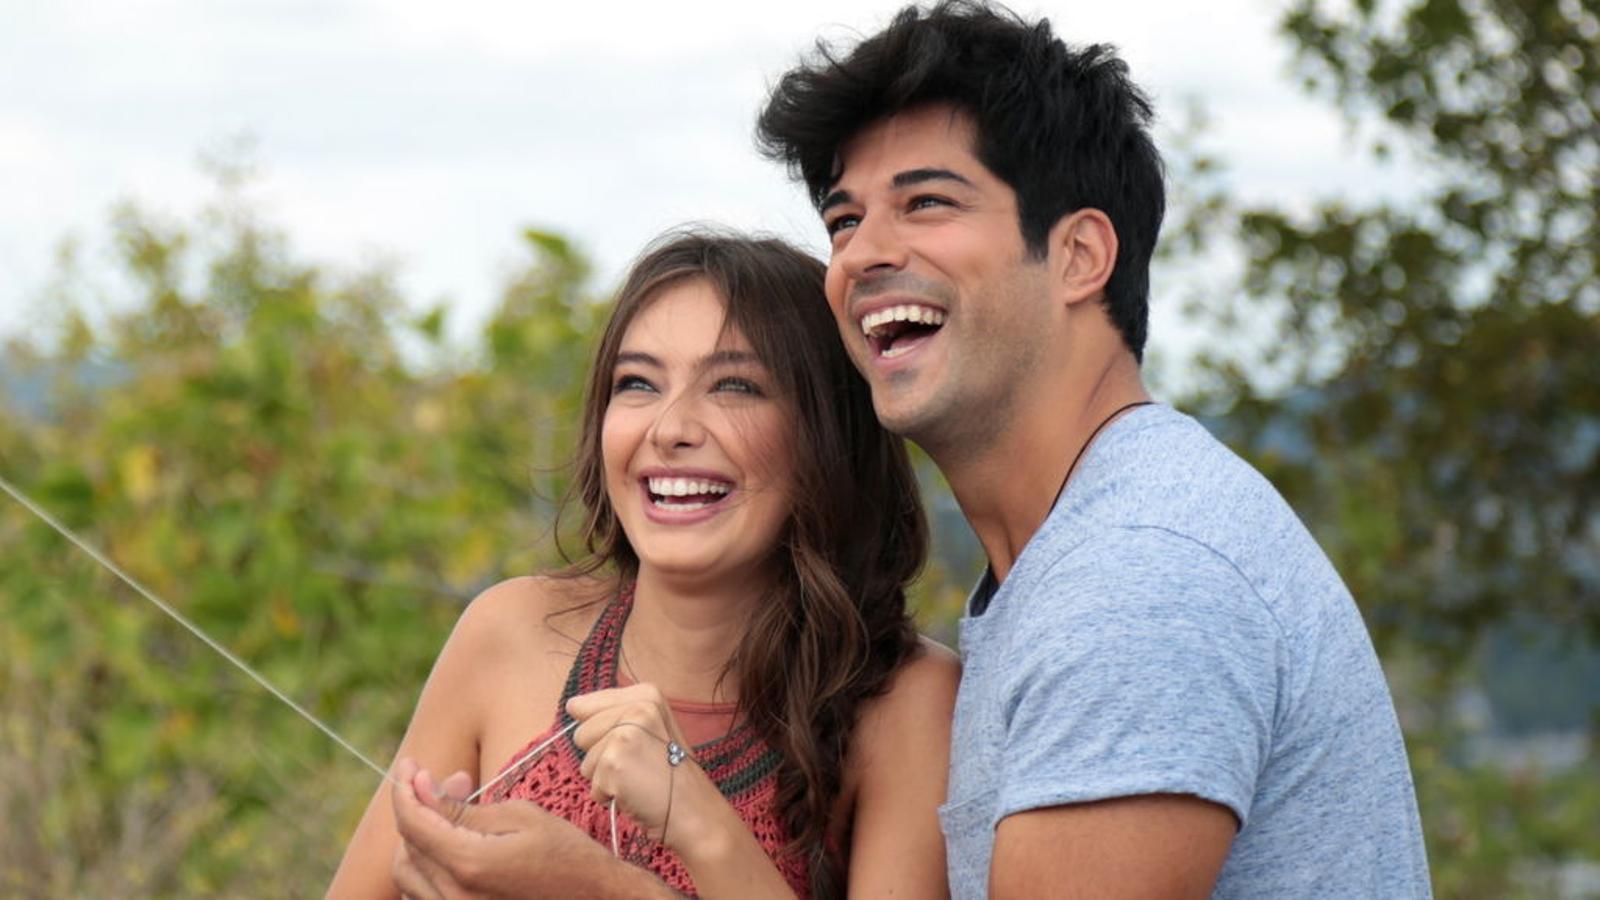 Telecinco aparta puntualment Sálvame Limón per estrenar l'exitosa sèrie turca 'Kara sevda'